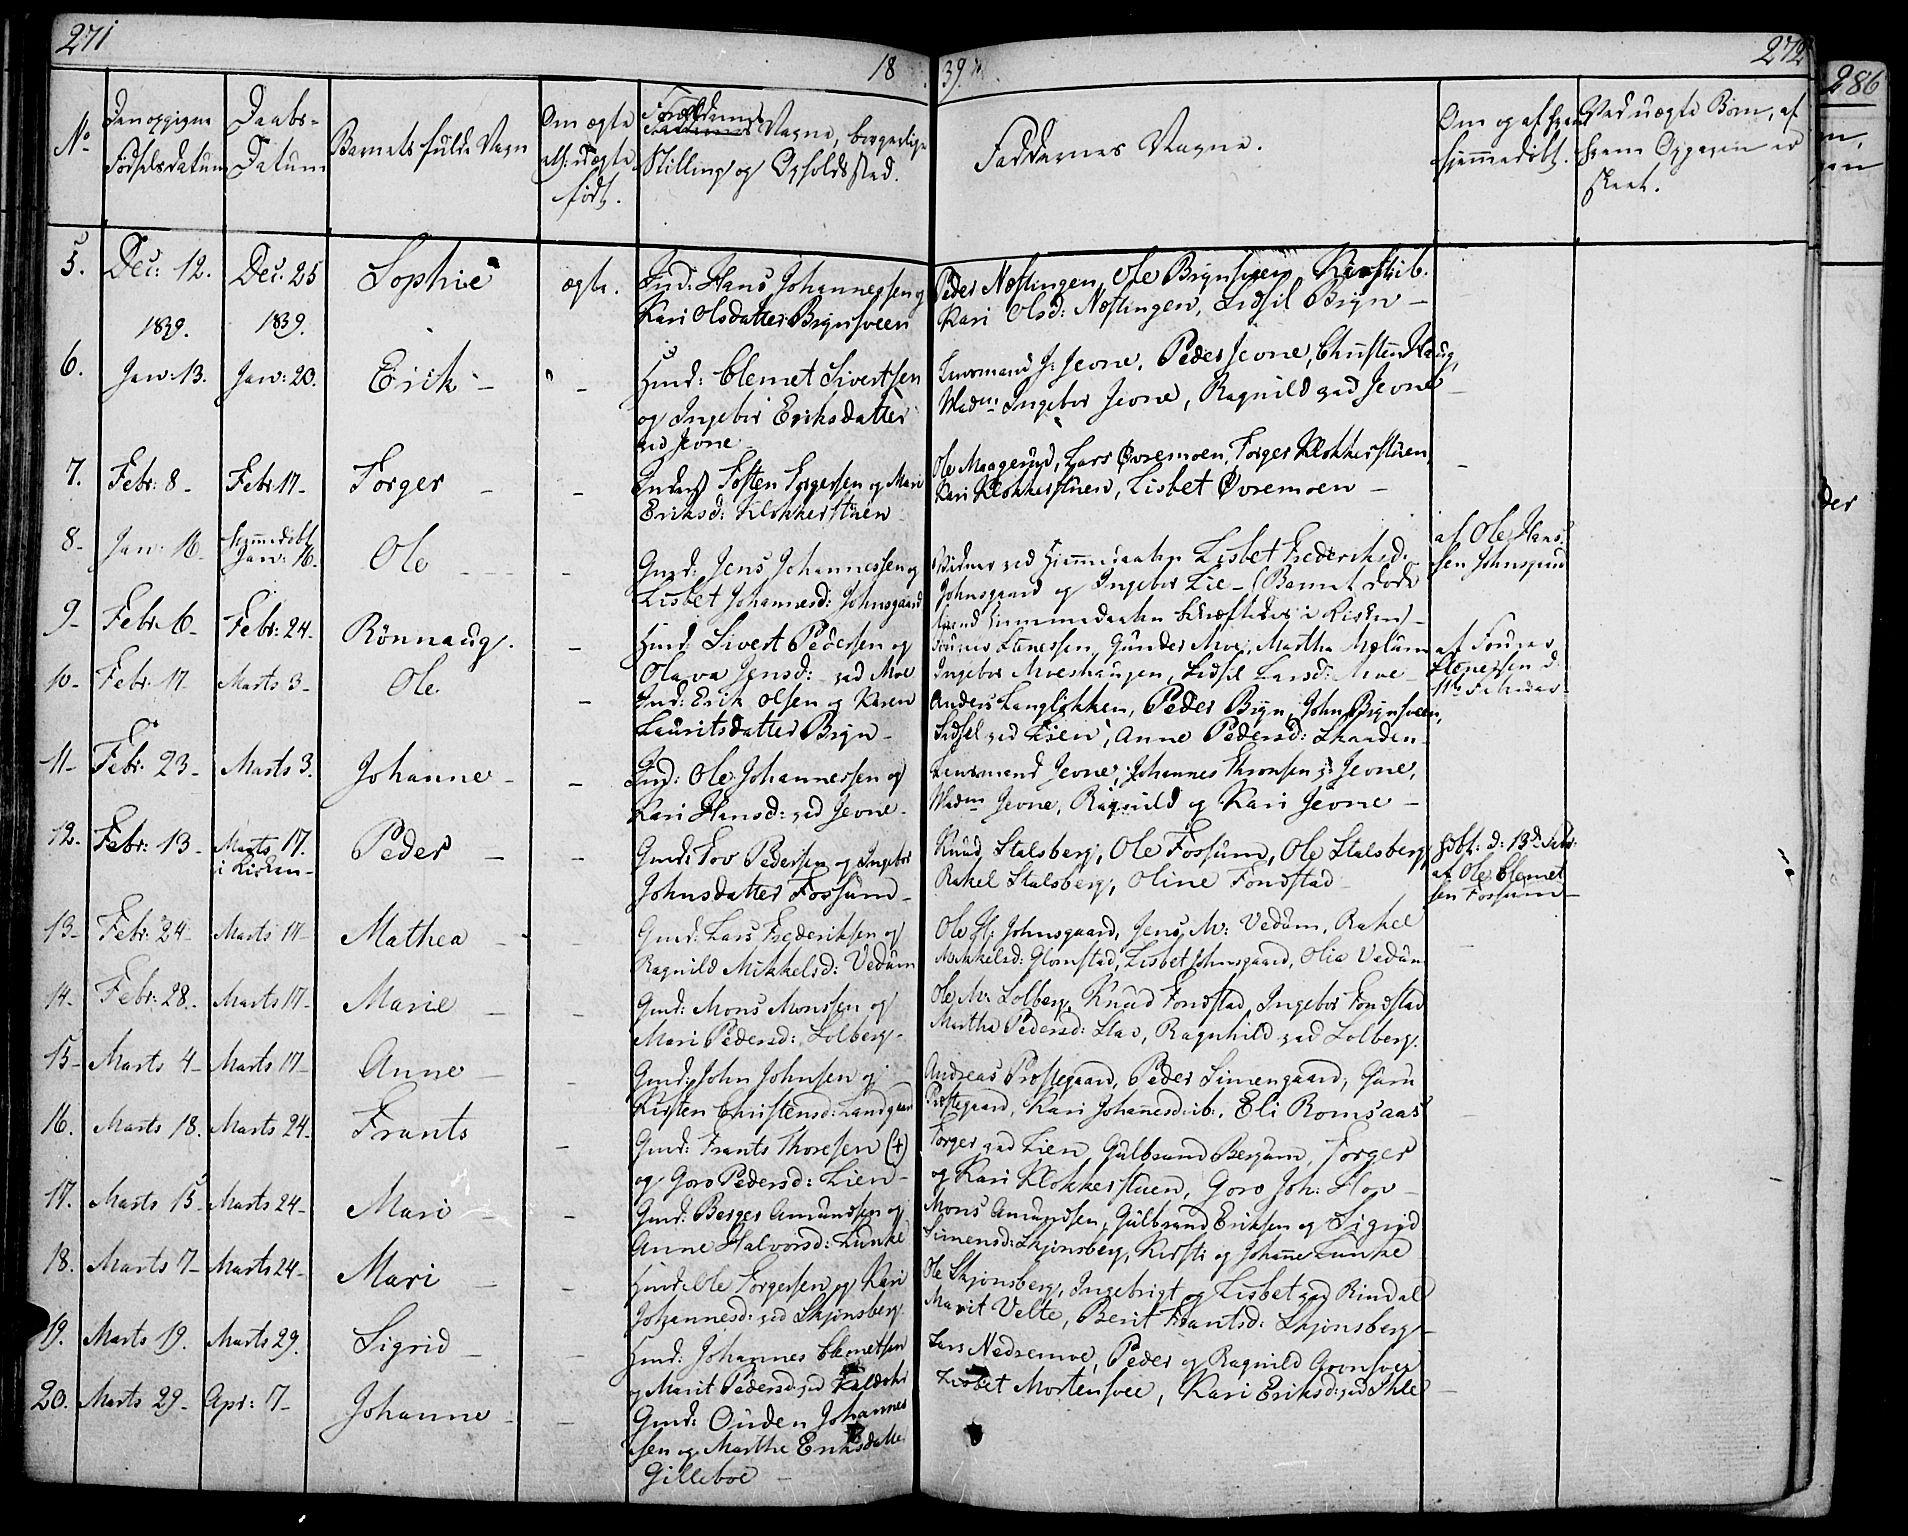 SAH, Øyer prestekontor, Ministerialbok nr. 4, 1824-1841, s. 271-272